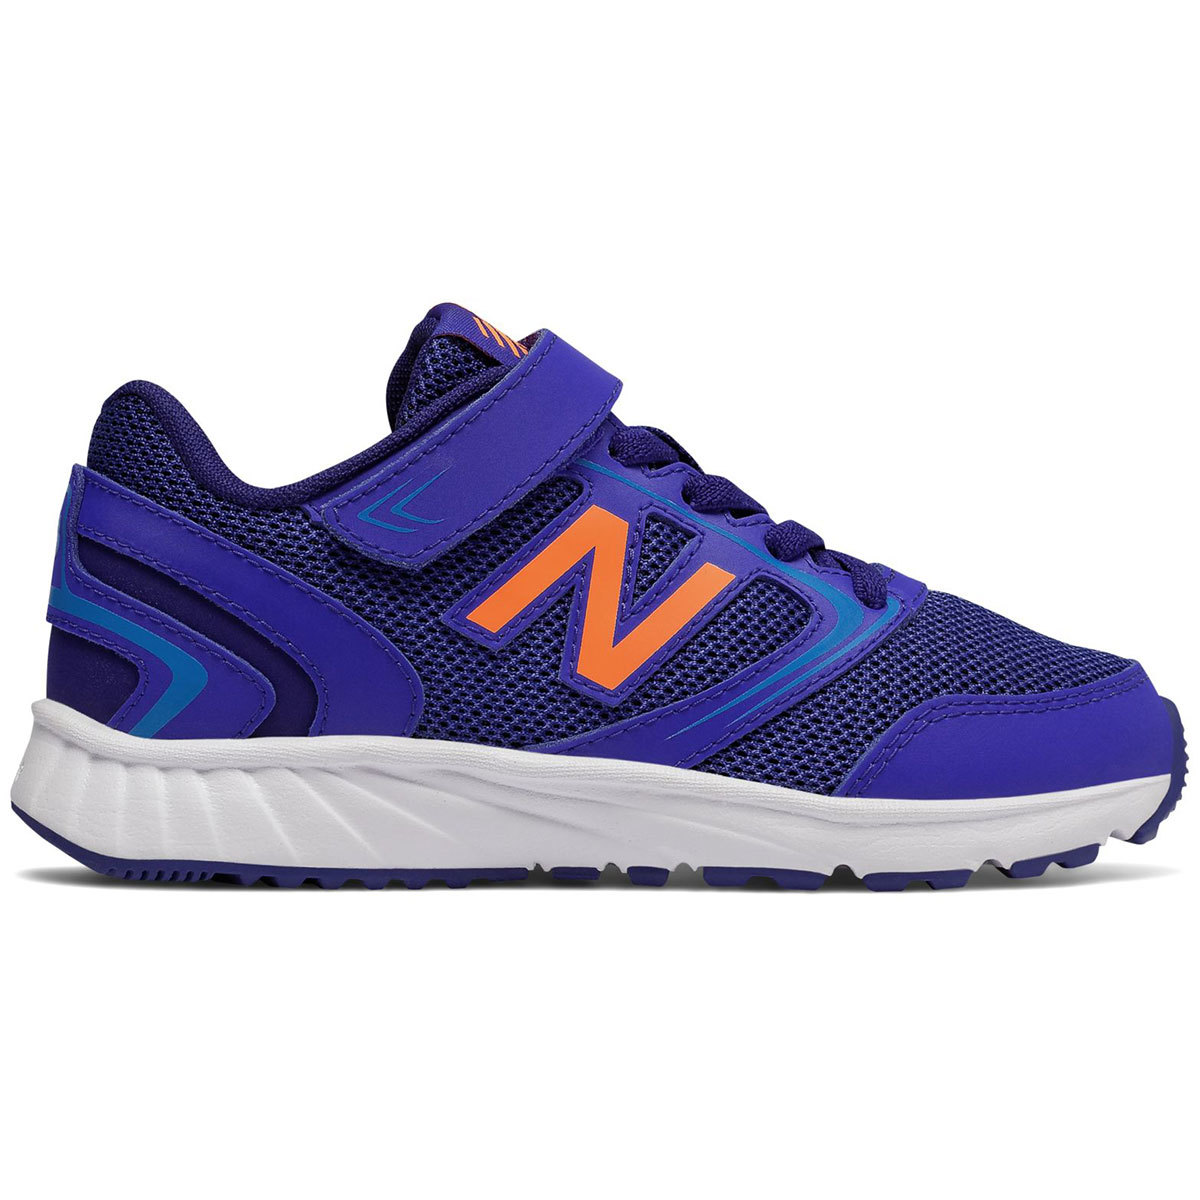 New Balance Boys' 455V1 Running Shoes, Wide - Blue, 3